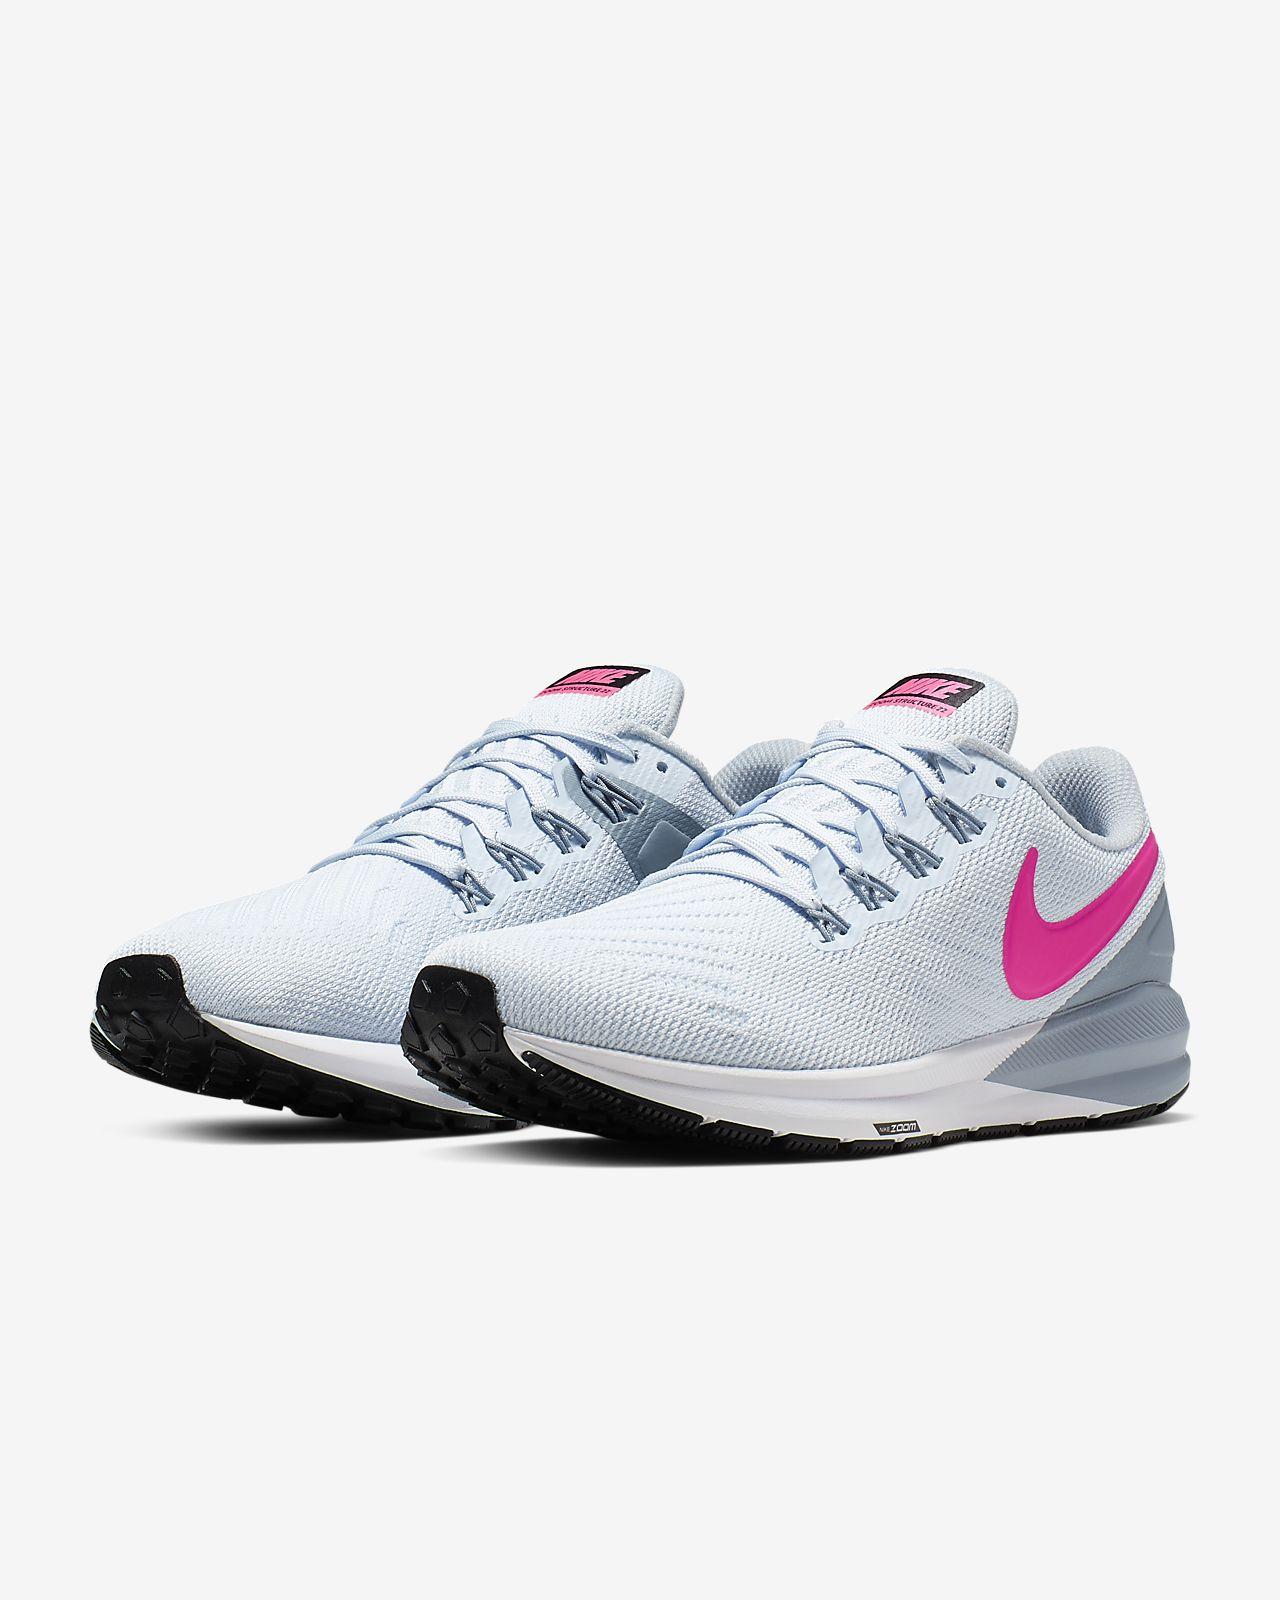 a57c0bd939734 Nike Air Zoom Structure 22 Women s Running Shoe. Nike.com